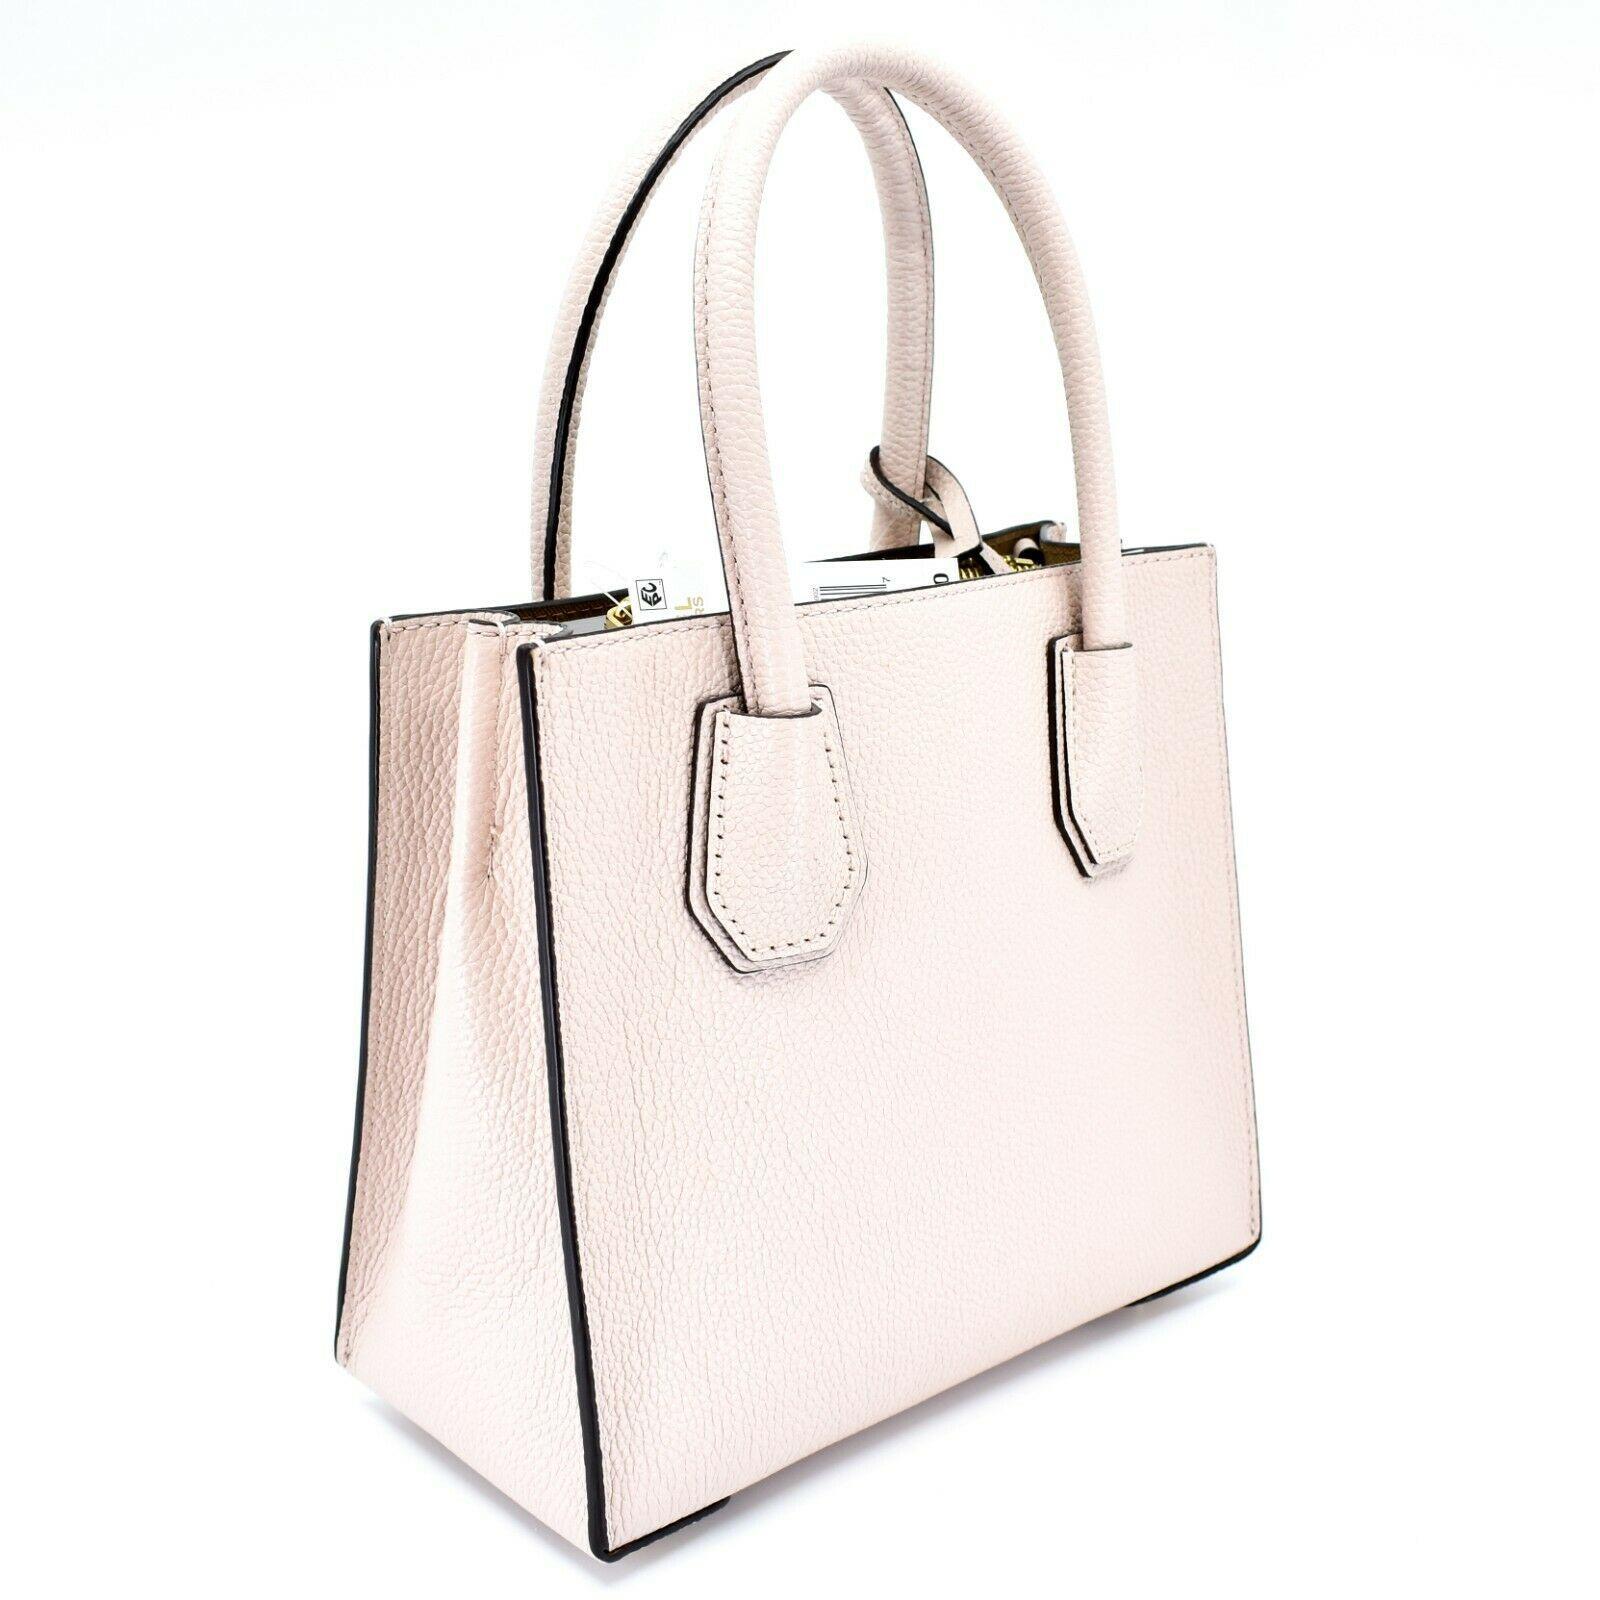 Michael Kors Mercer Soft Pink Pebbled Leather Medium Crossbody Messenger Bag image 3